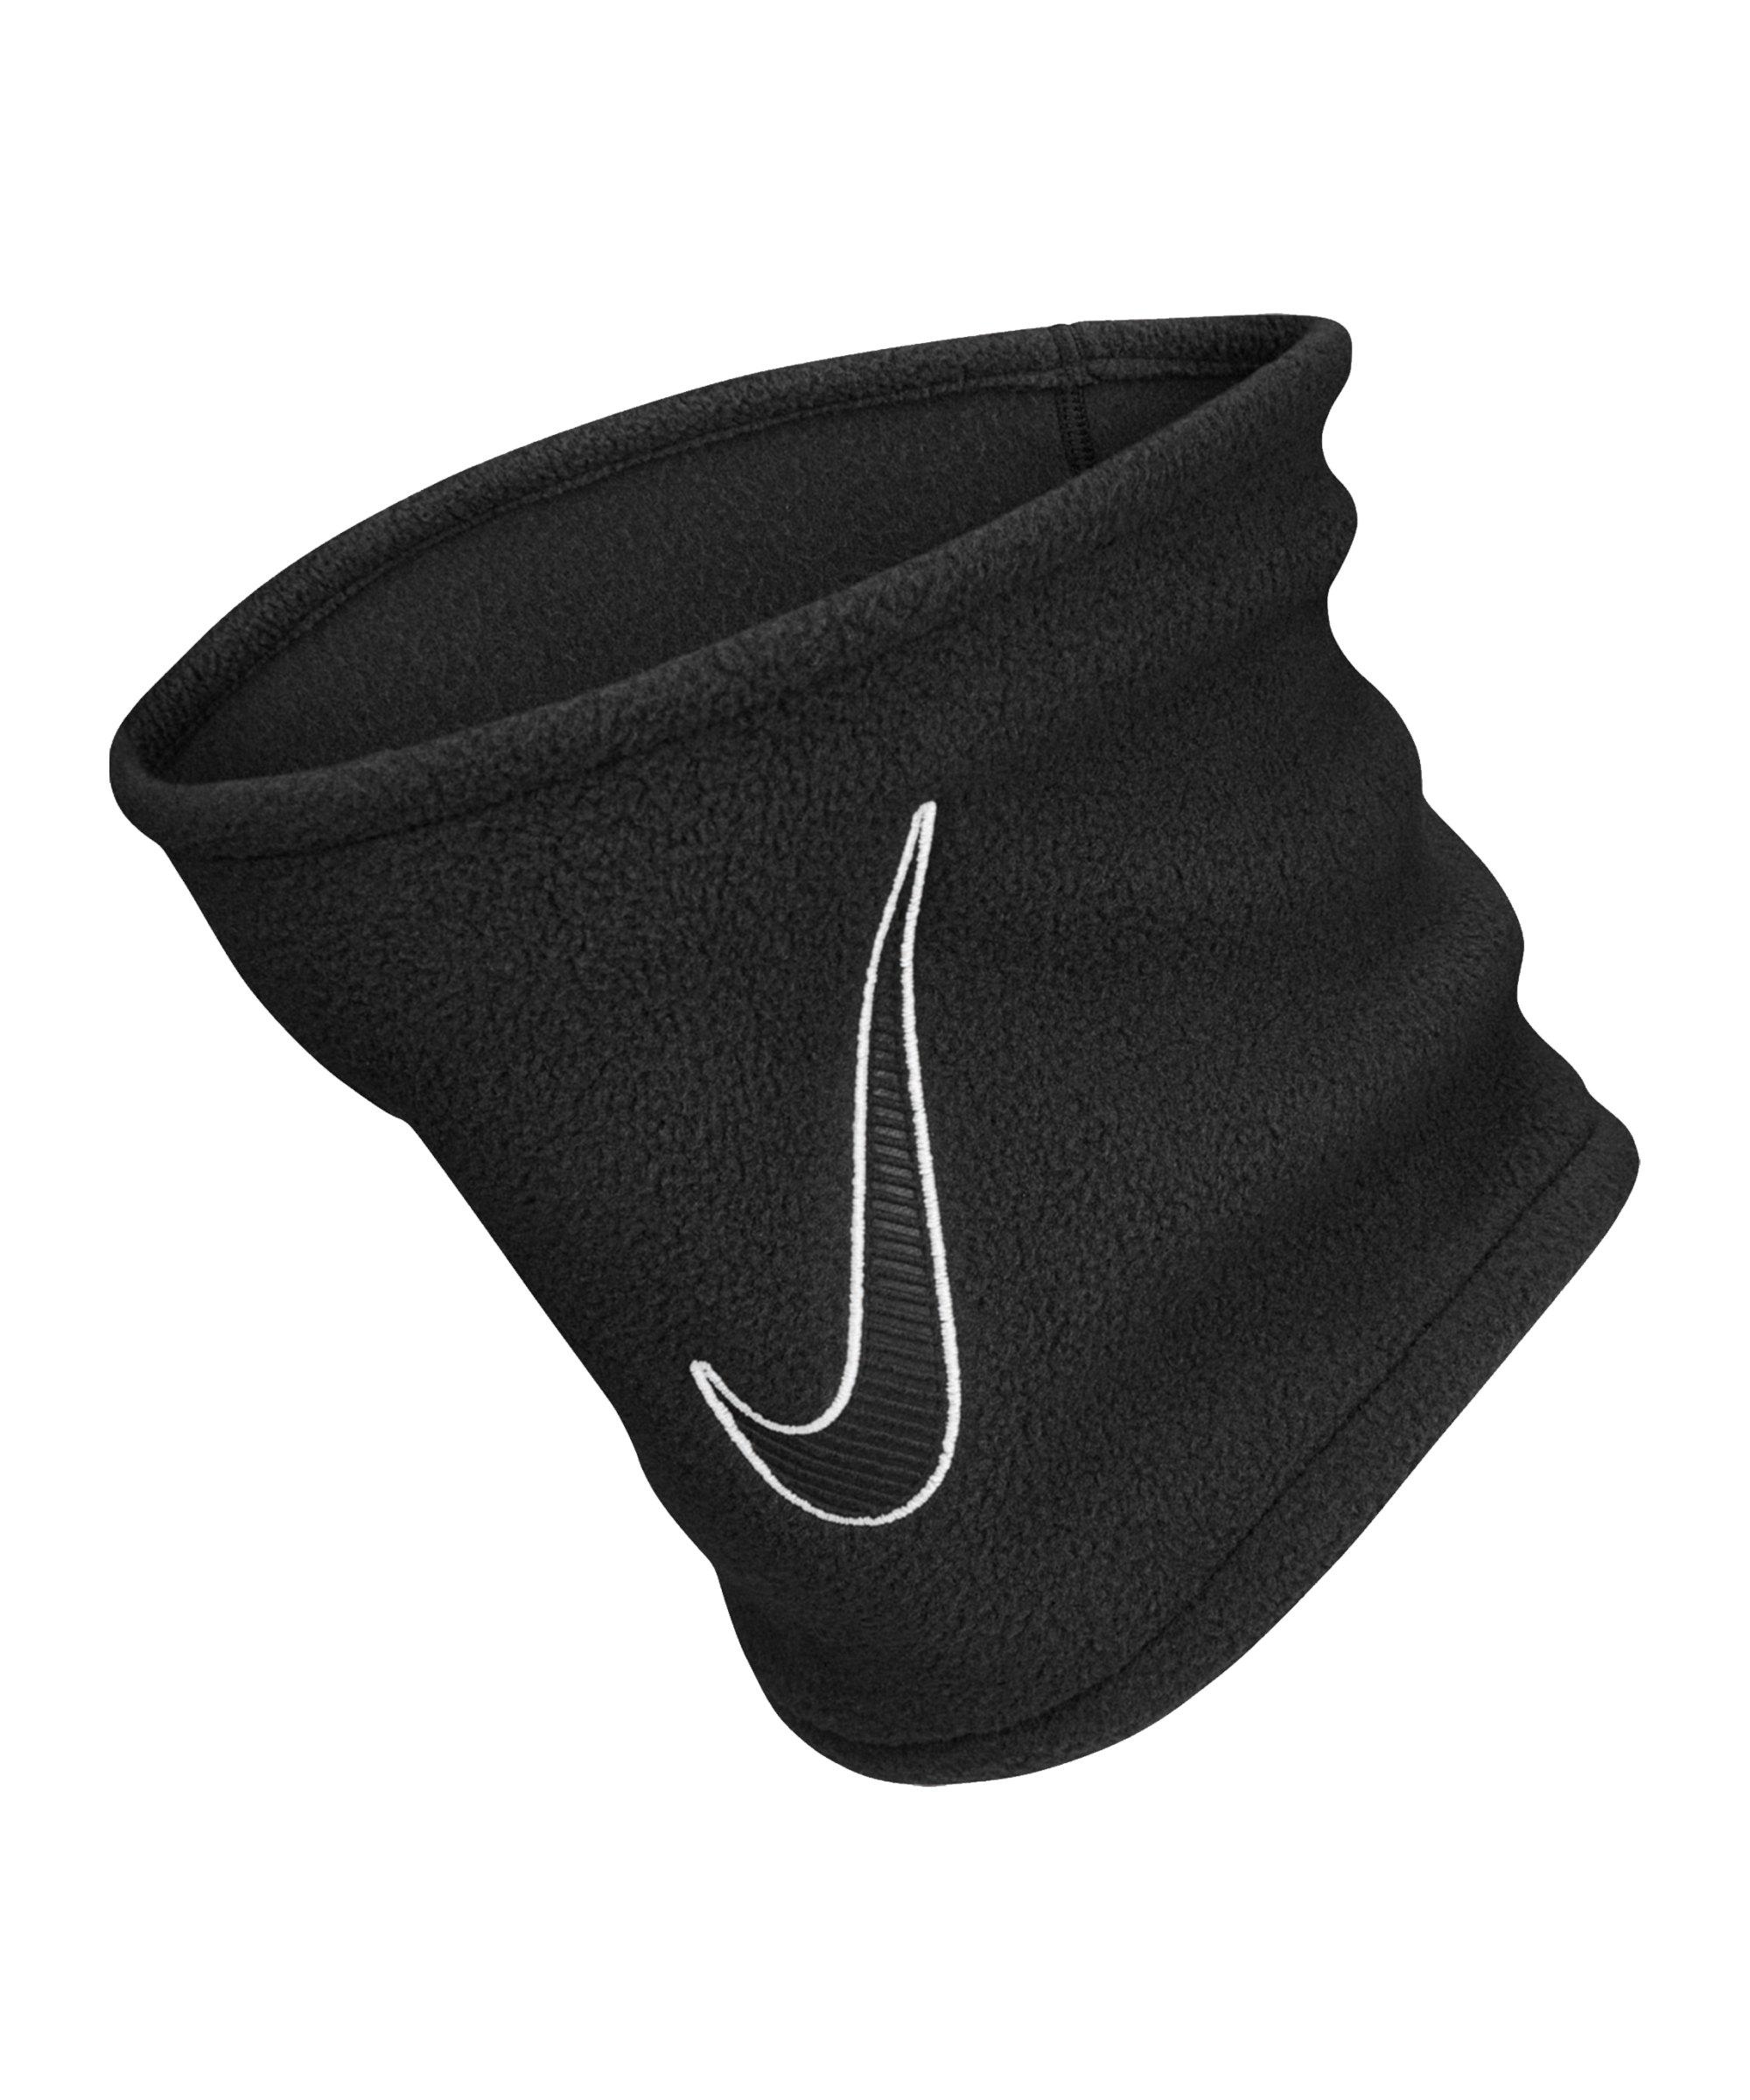 Nike Fleece Neckwarmer 2.0 Kids Schwarz F010 - schwarz